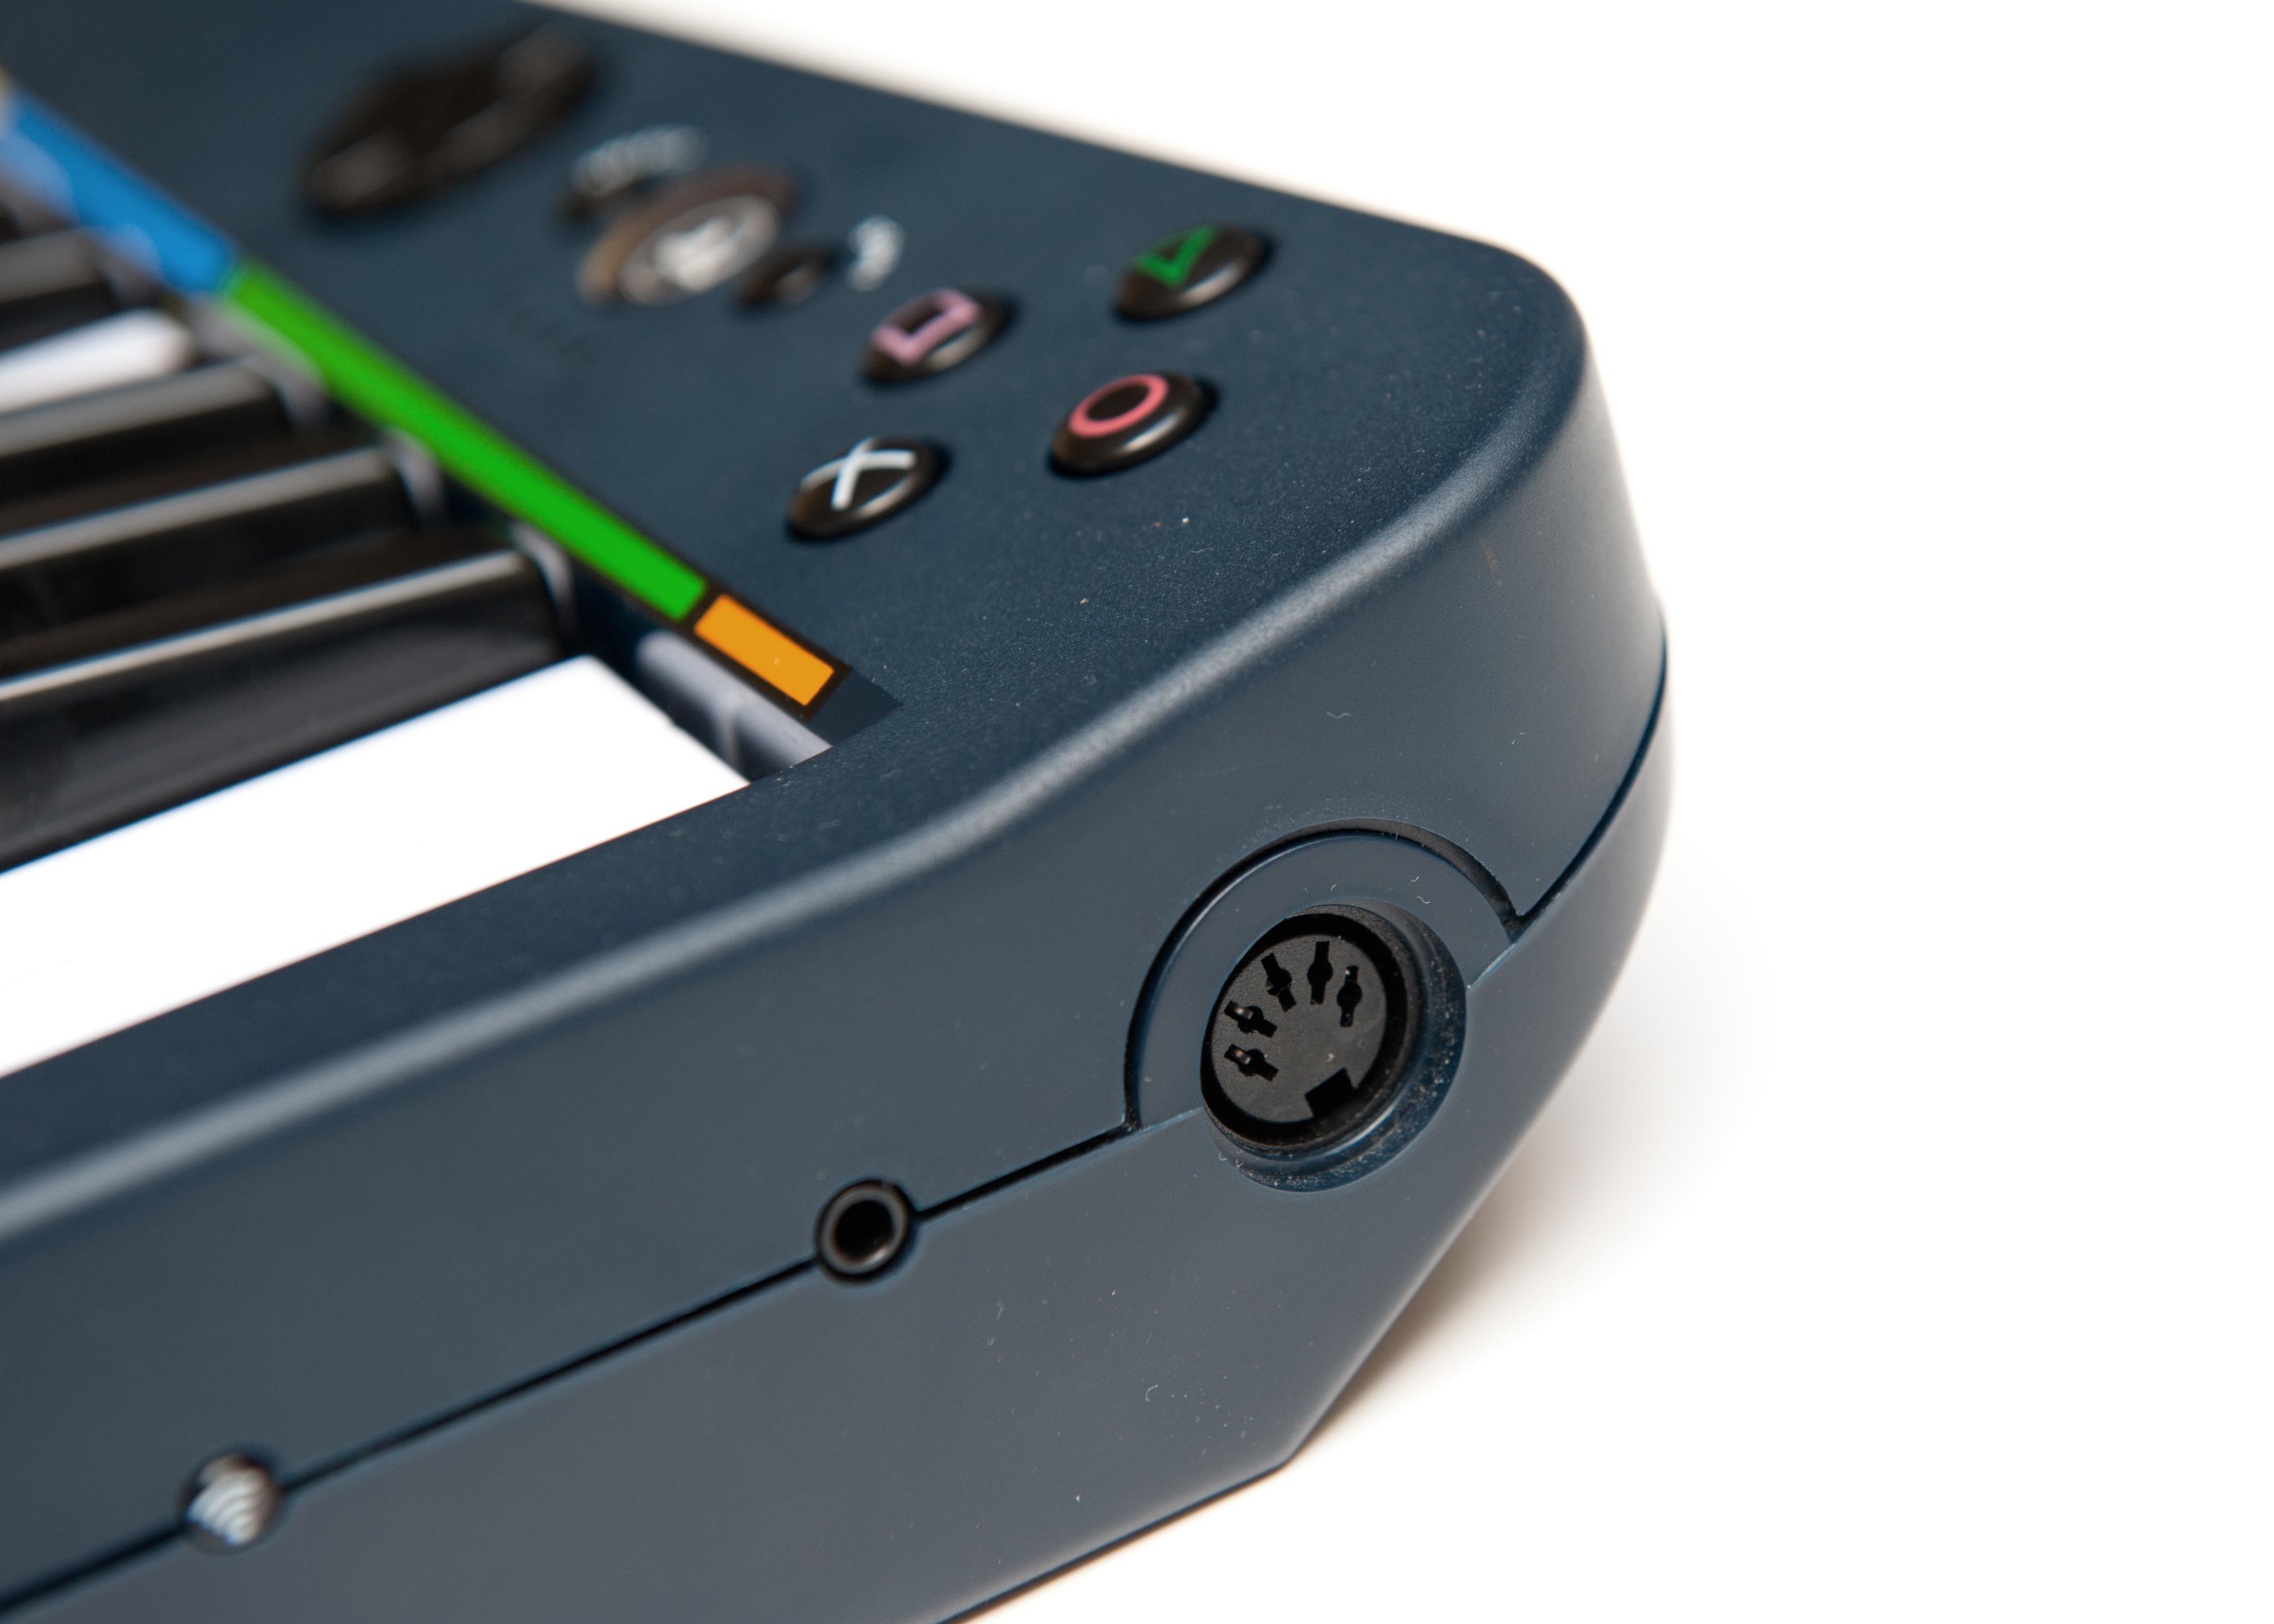 File:Pro Keys MIDI jpg - Wikimedia Commons